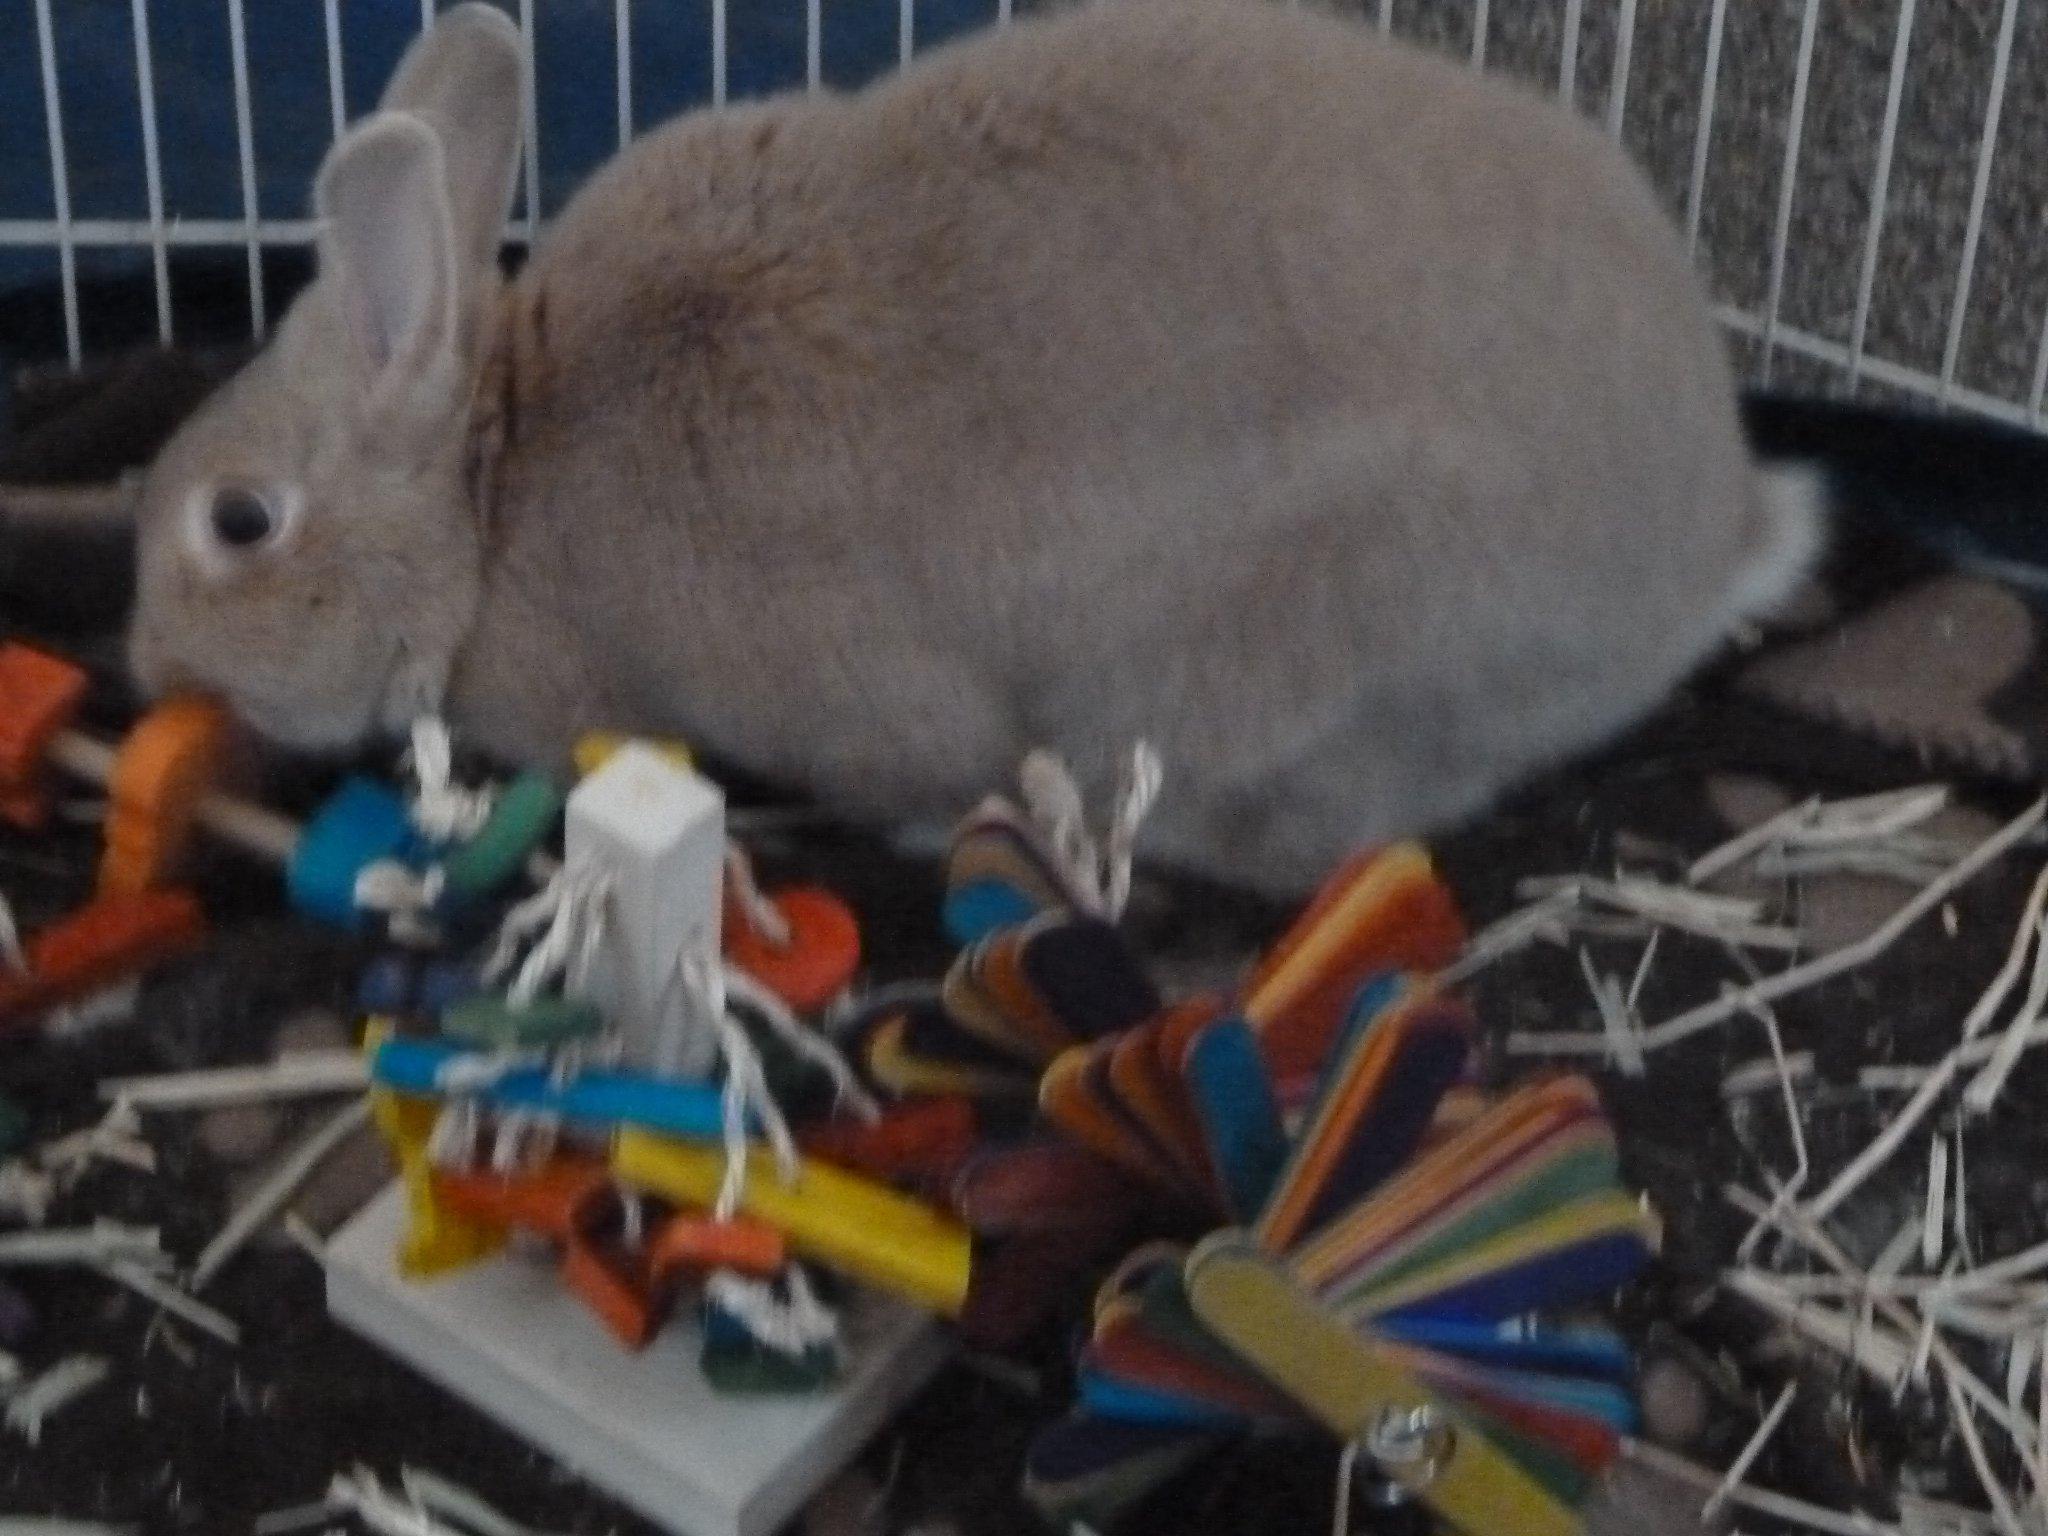 ''The Tree'' Pet Rabbit Toy by Happy Rabbit Toys